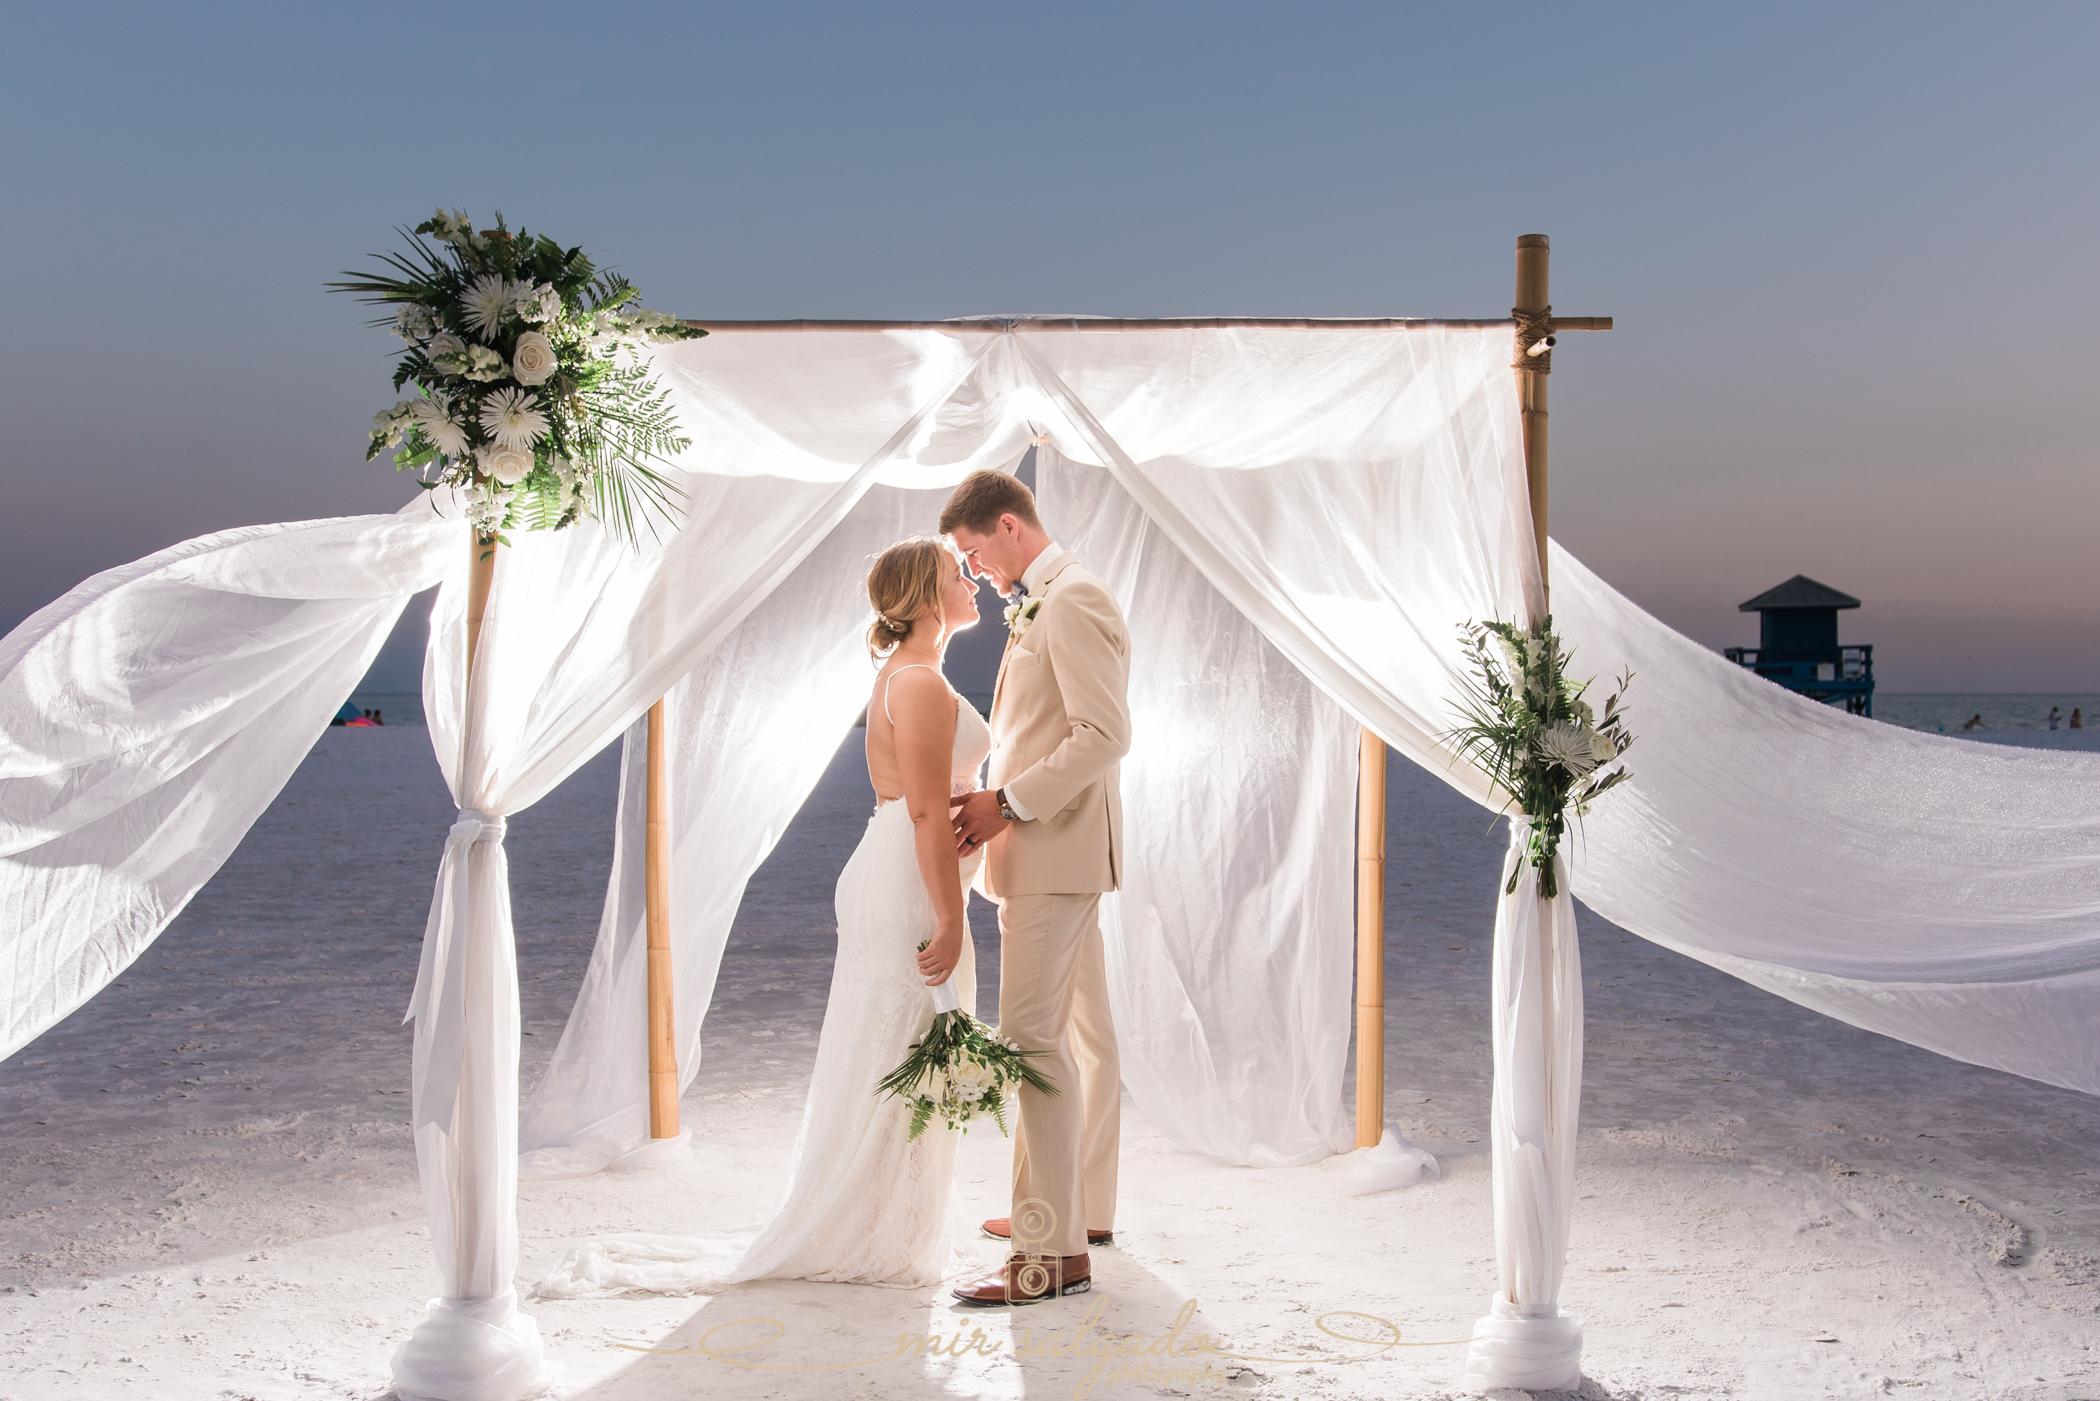 Florida-beach-wedding-photo, Tampa-wedding-photographer, Sarasota-wedding-photographer, Destination-wedding-photographer